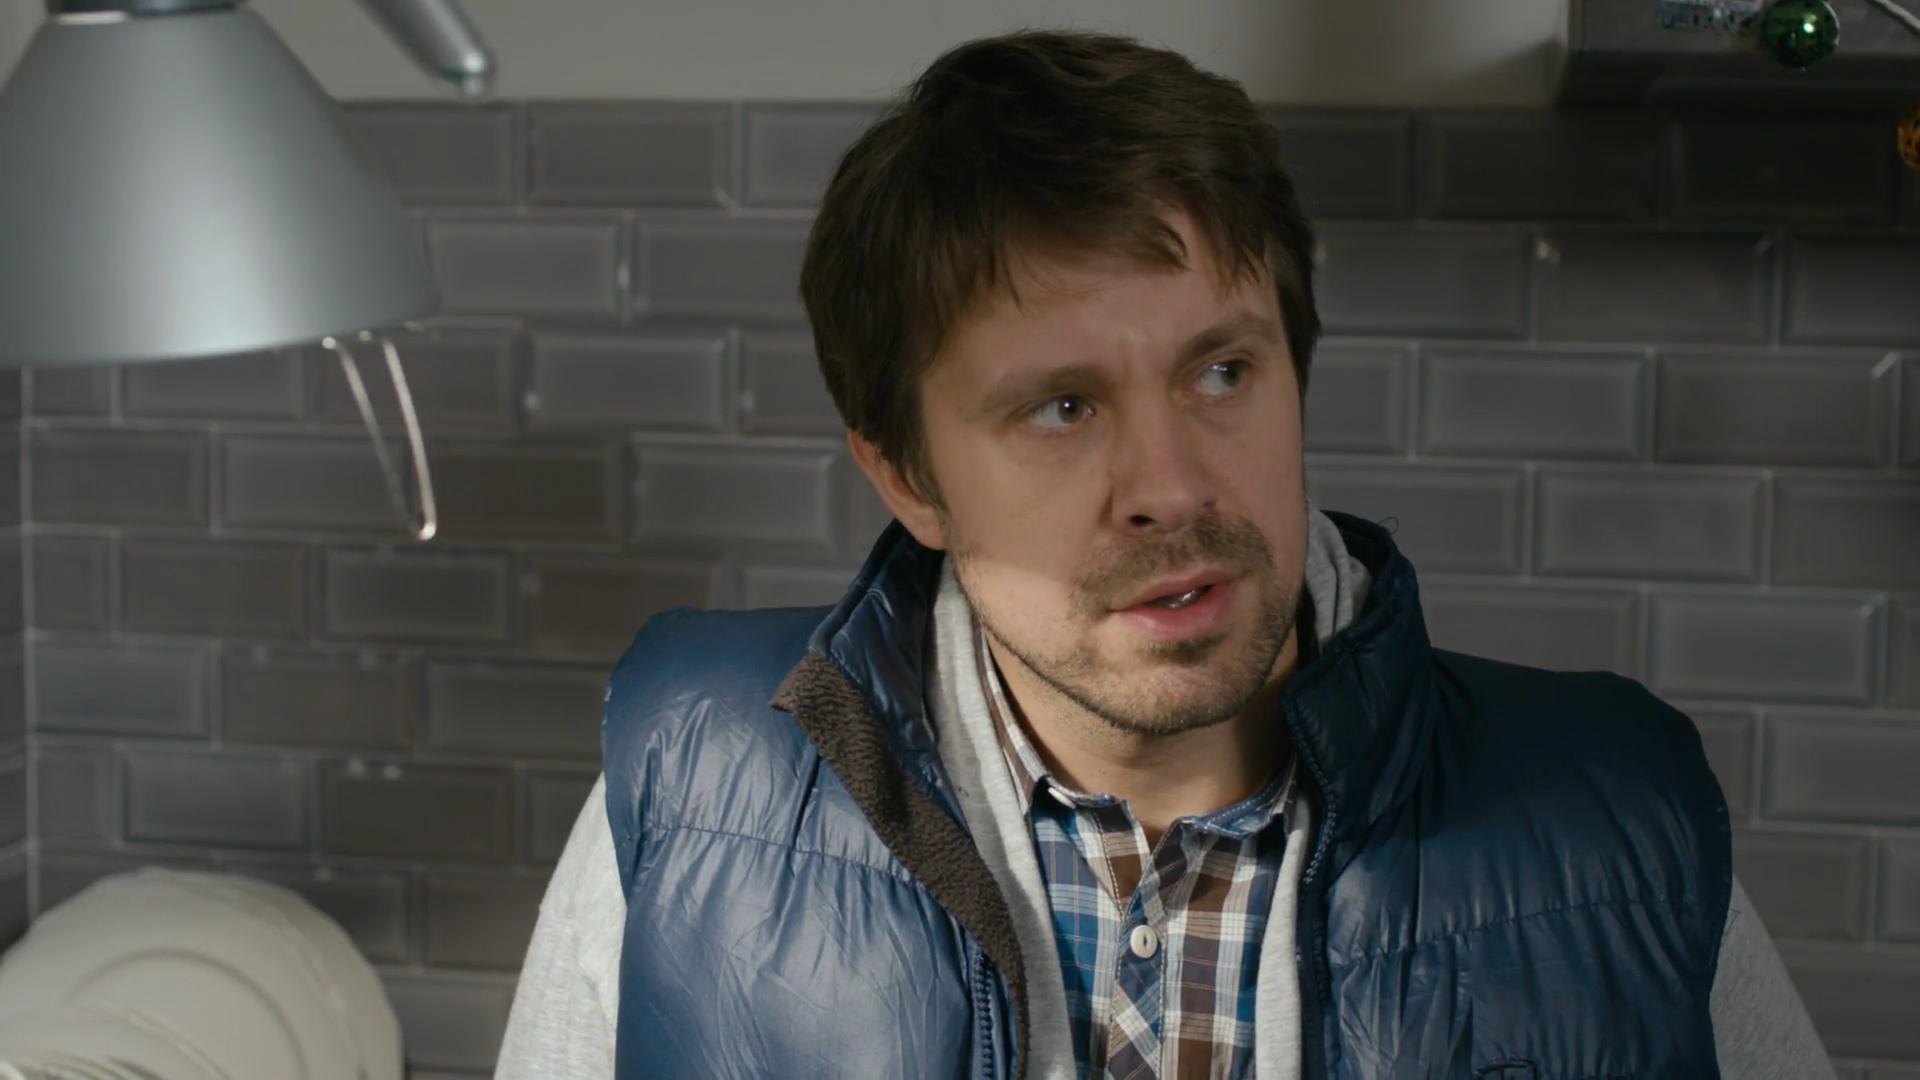 Сергей Перегудов (Sergey Peregudov), Актер: фото